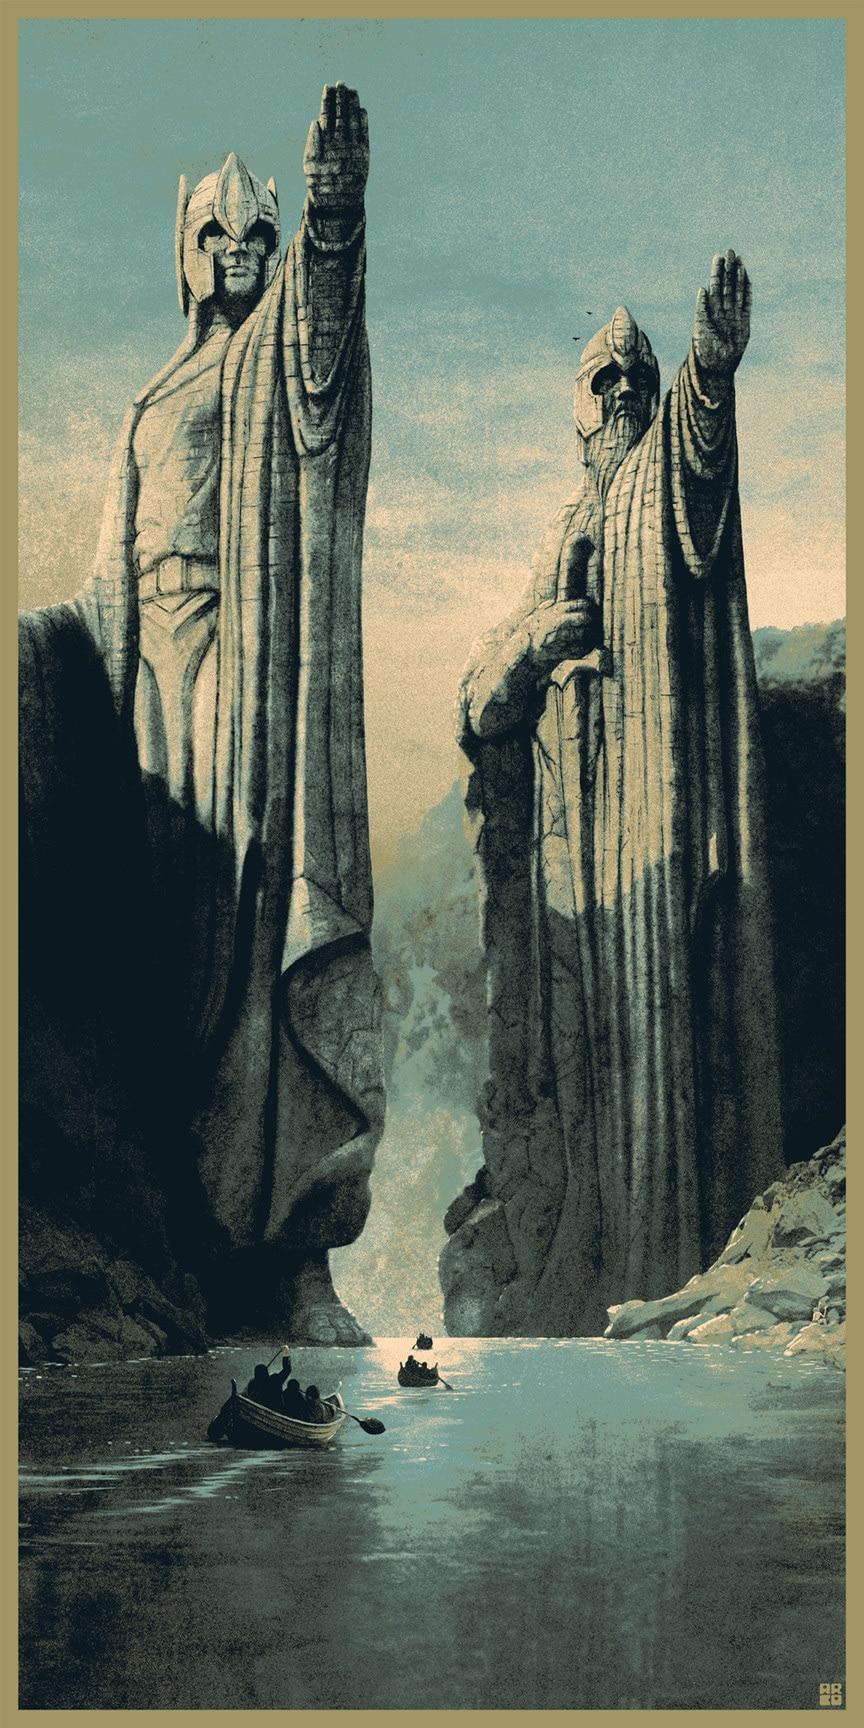 Lord of the Rings Print Set from Matt Ferguson - Missed Prints